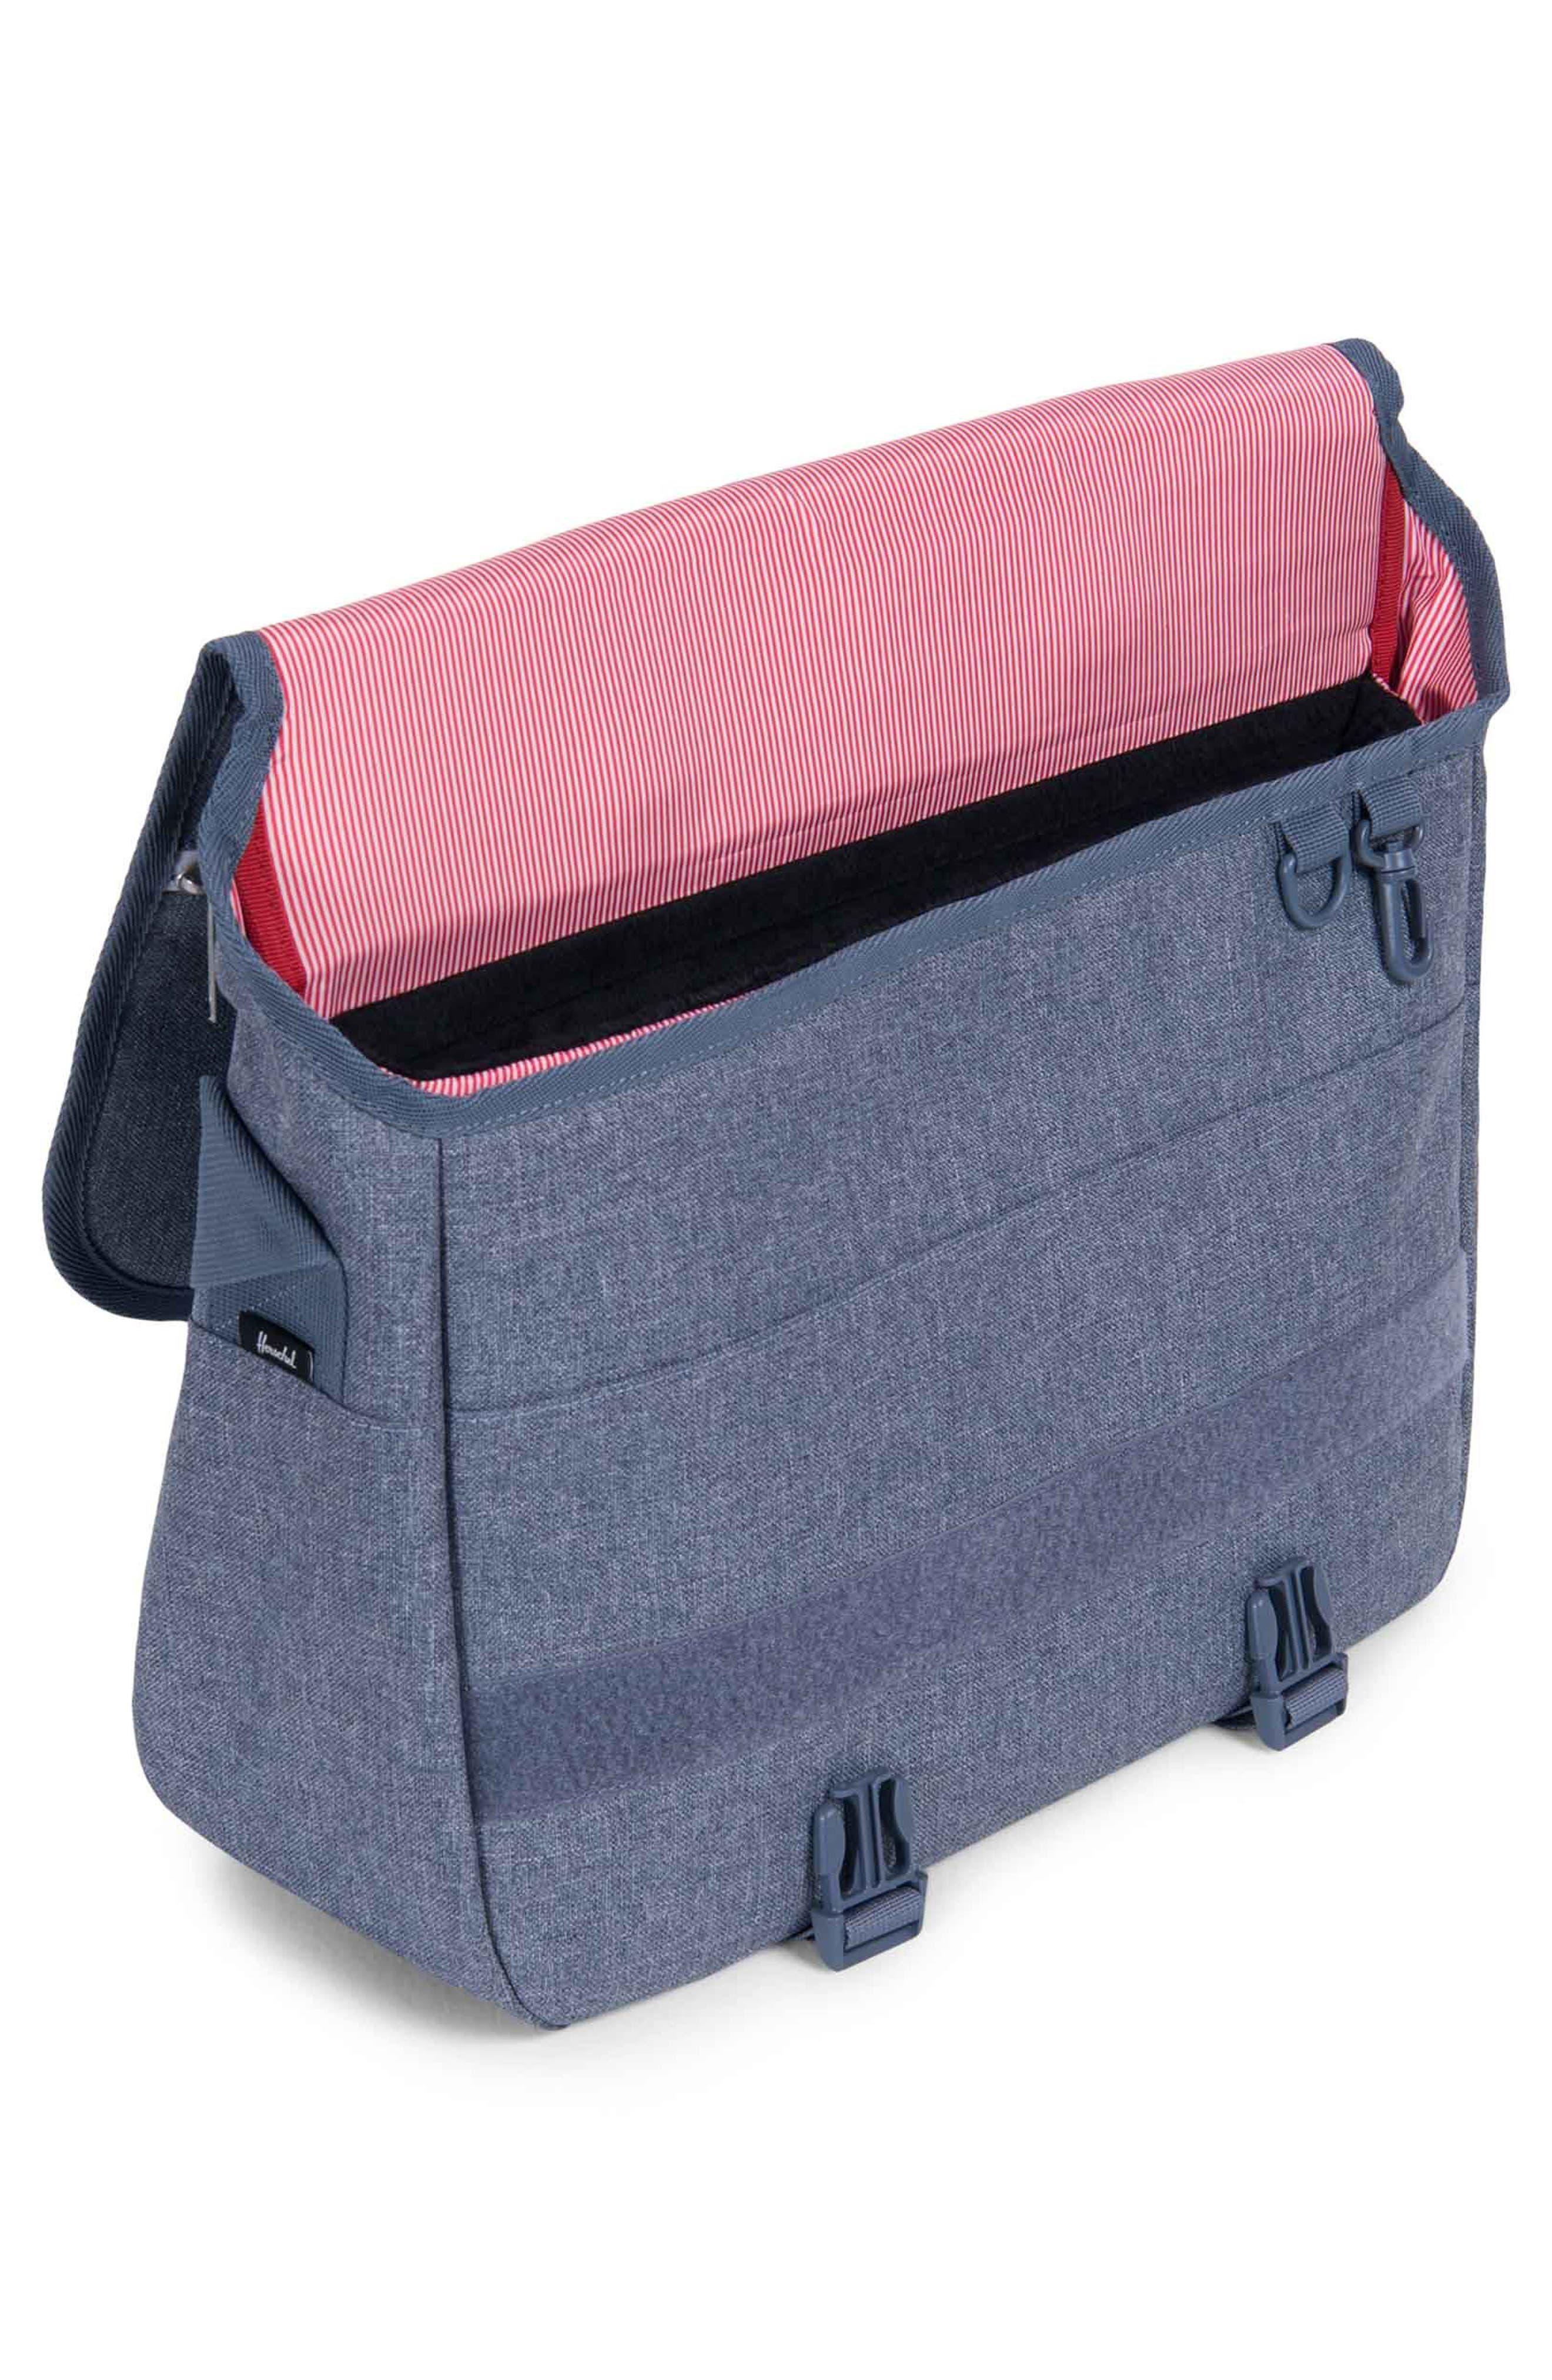 Alternate Image 3  - Herschel Supply Co. 'Pop Quiz' Messenger Bag